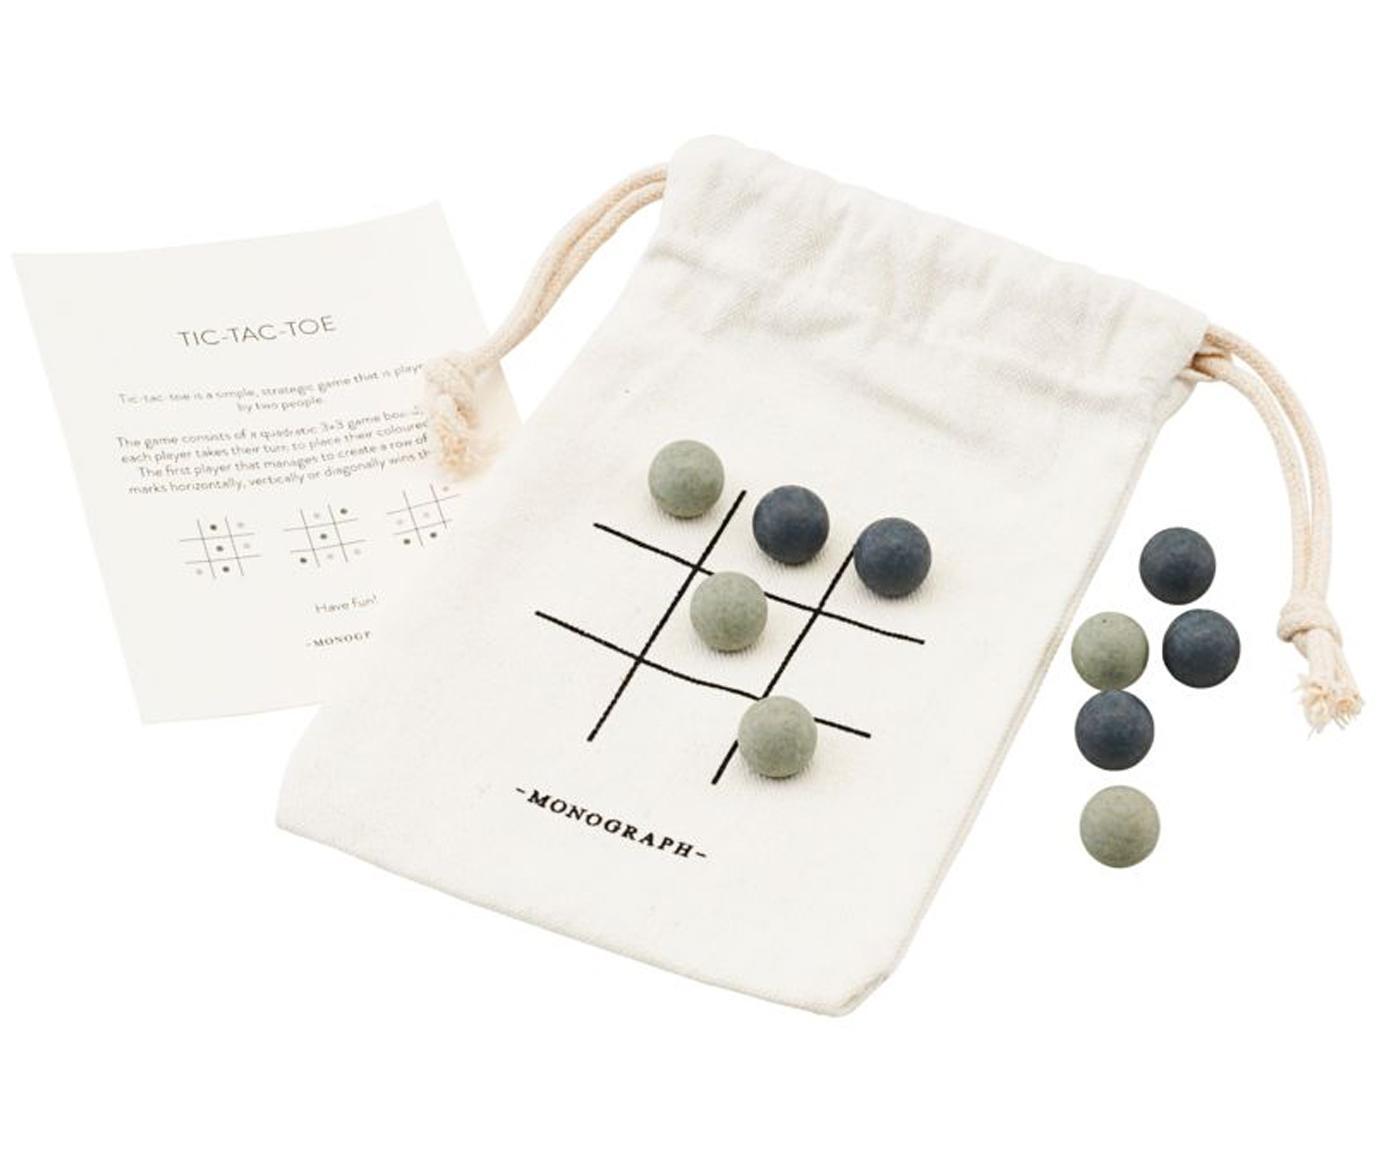 Brettspiel Tic Tac Toe, 10-tlg., Textil, Holz, Mehrfarbig, 10 x 12 cm